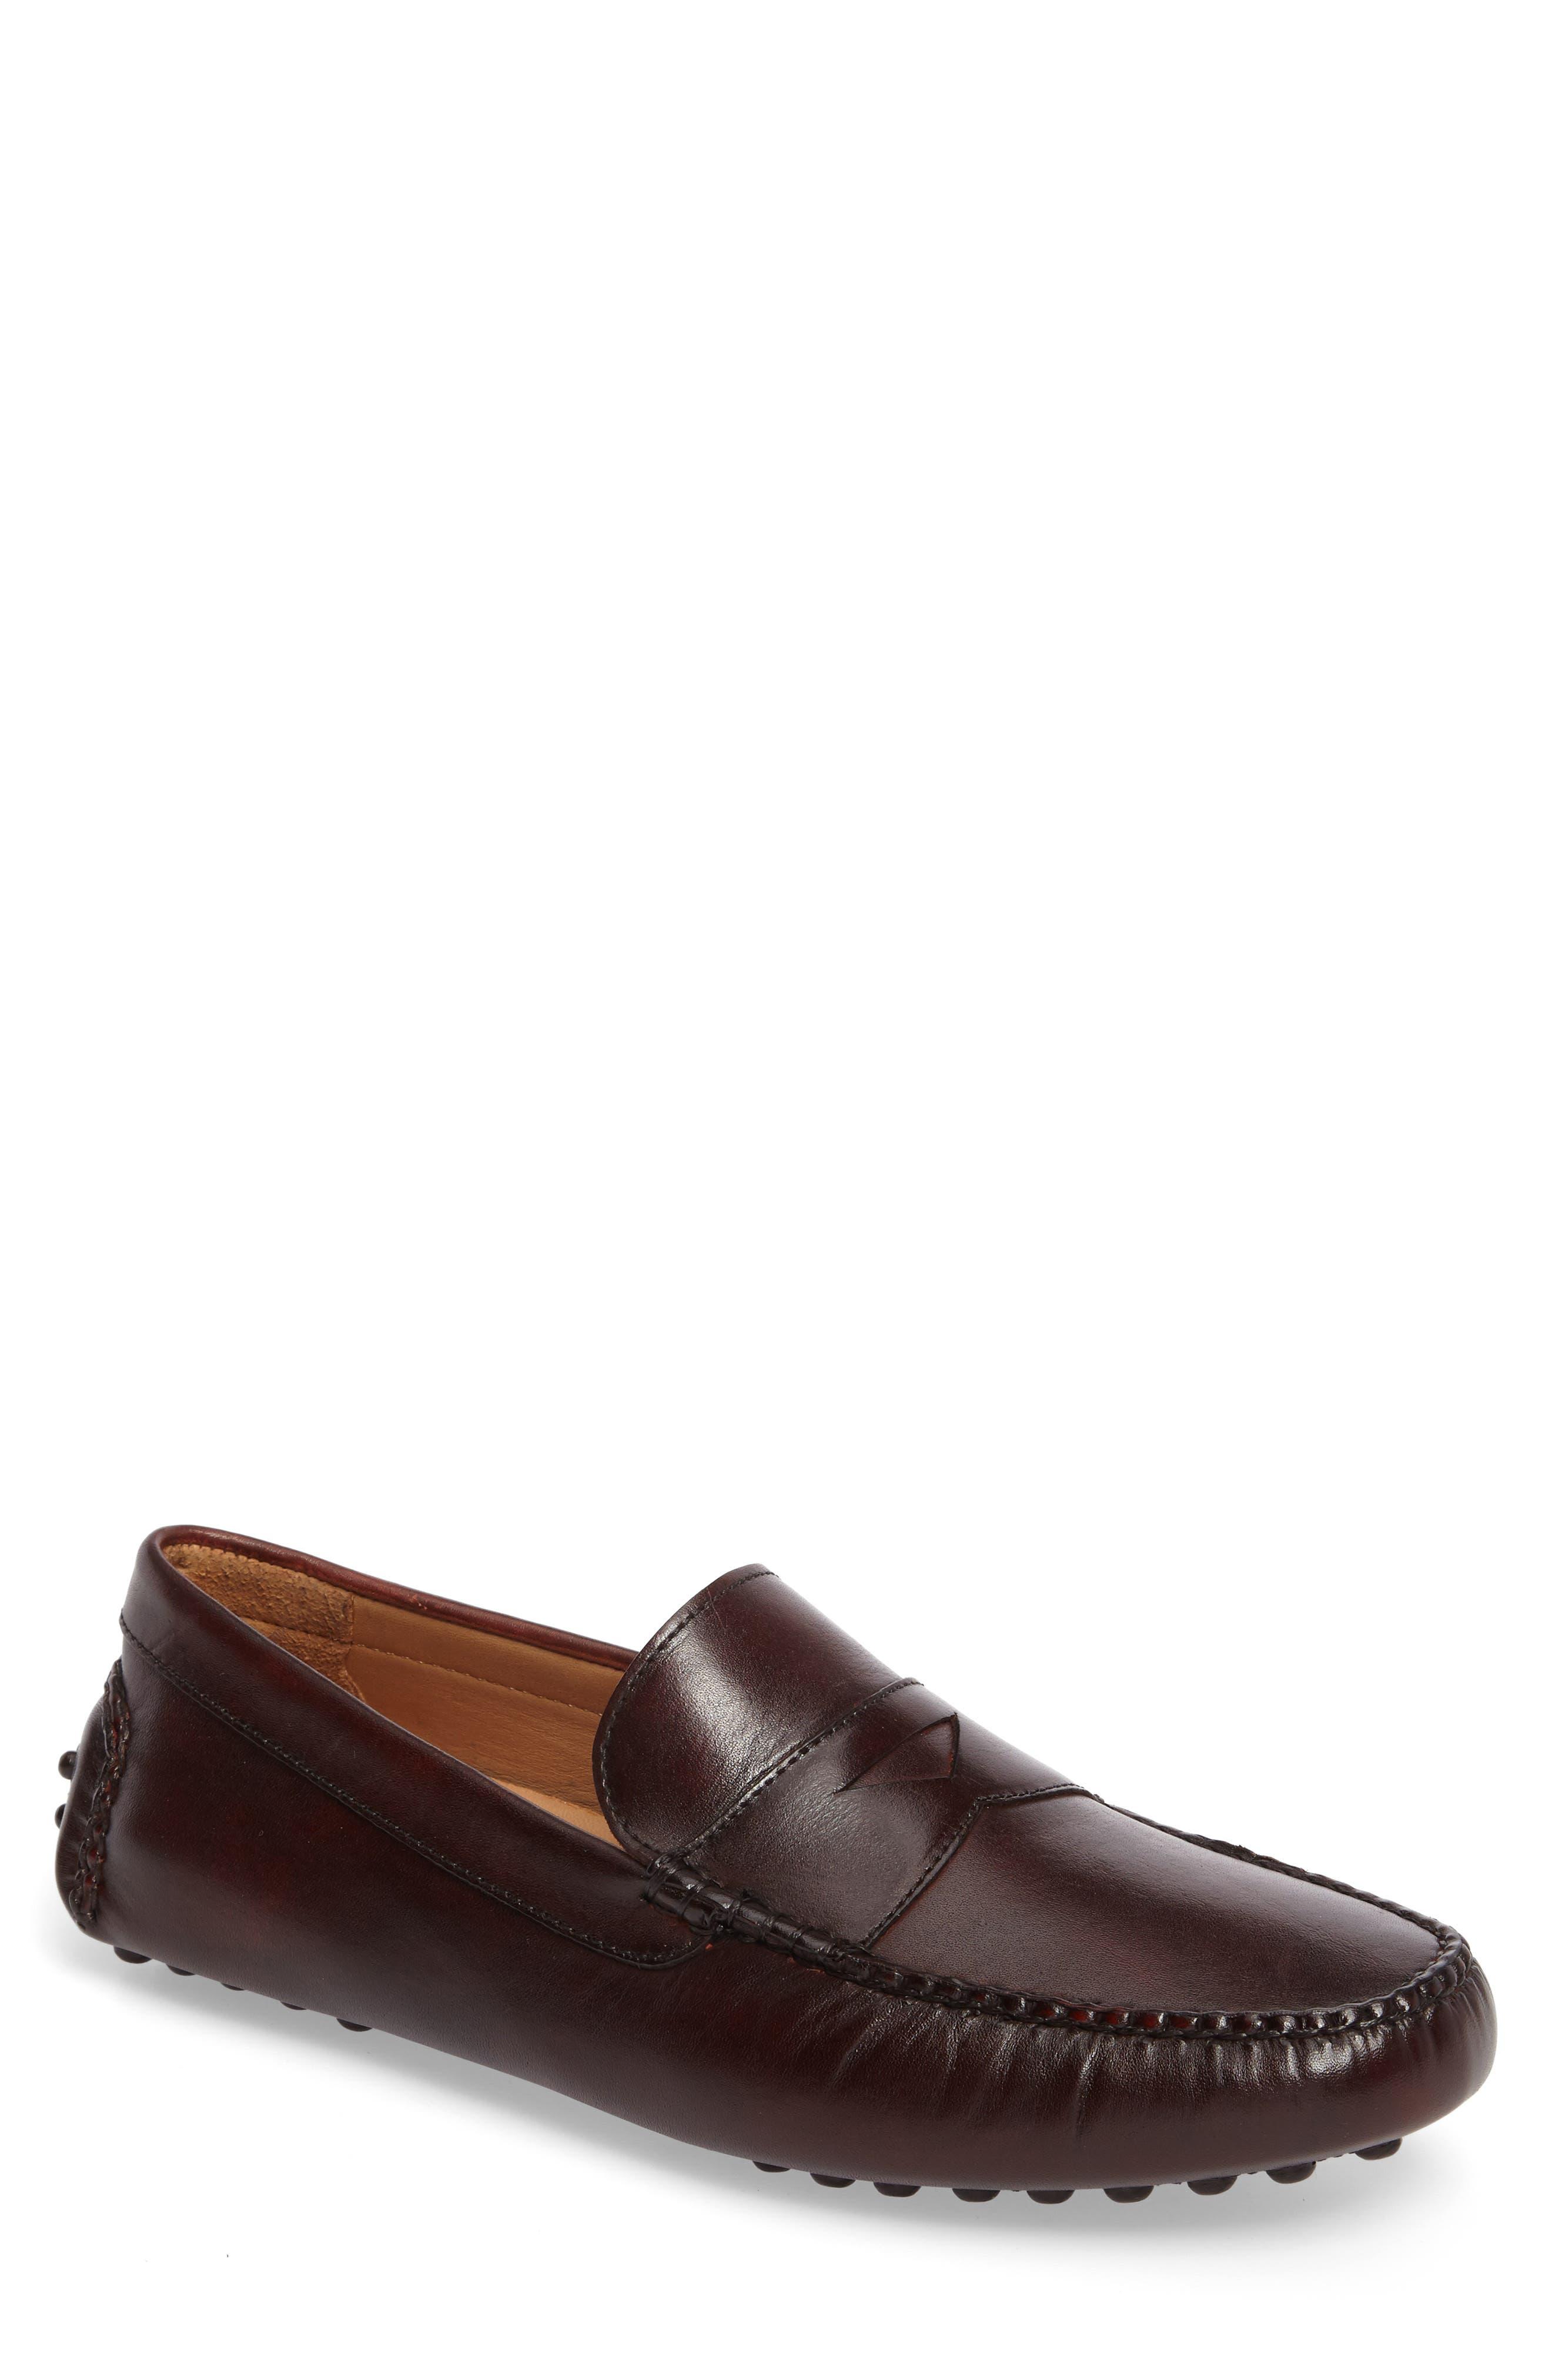 Alternate Image 1 Selected - John W. Nordstrom® Eaton Driving Shoe (Men)